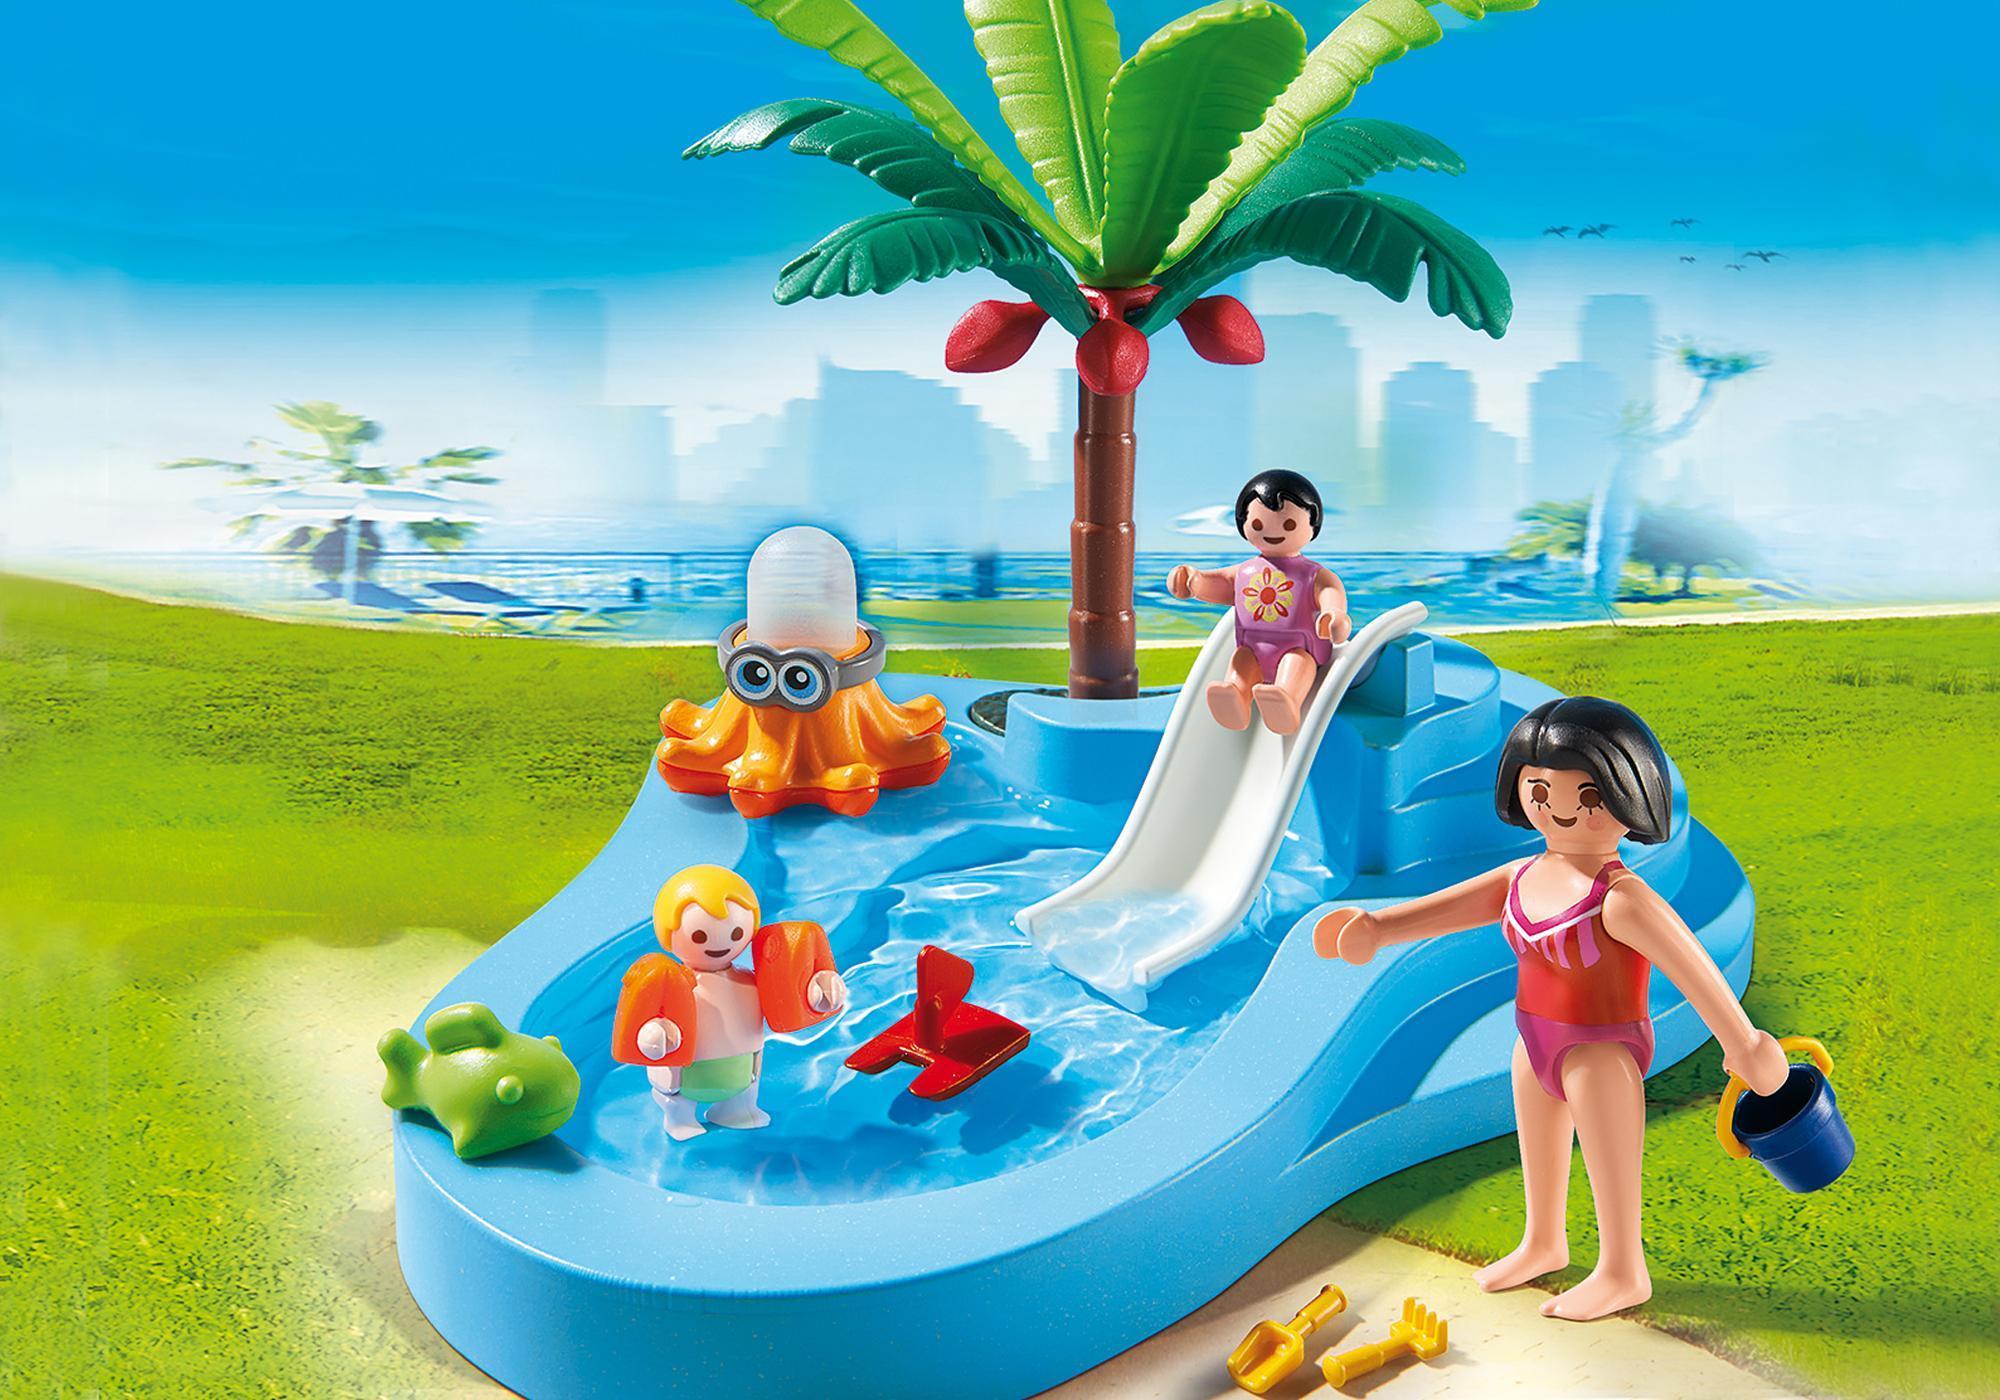 http://media.playmobil.com/i/playmobil/6673_product_detail/Piscinetta dei bimbi con scivolo